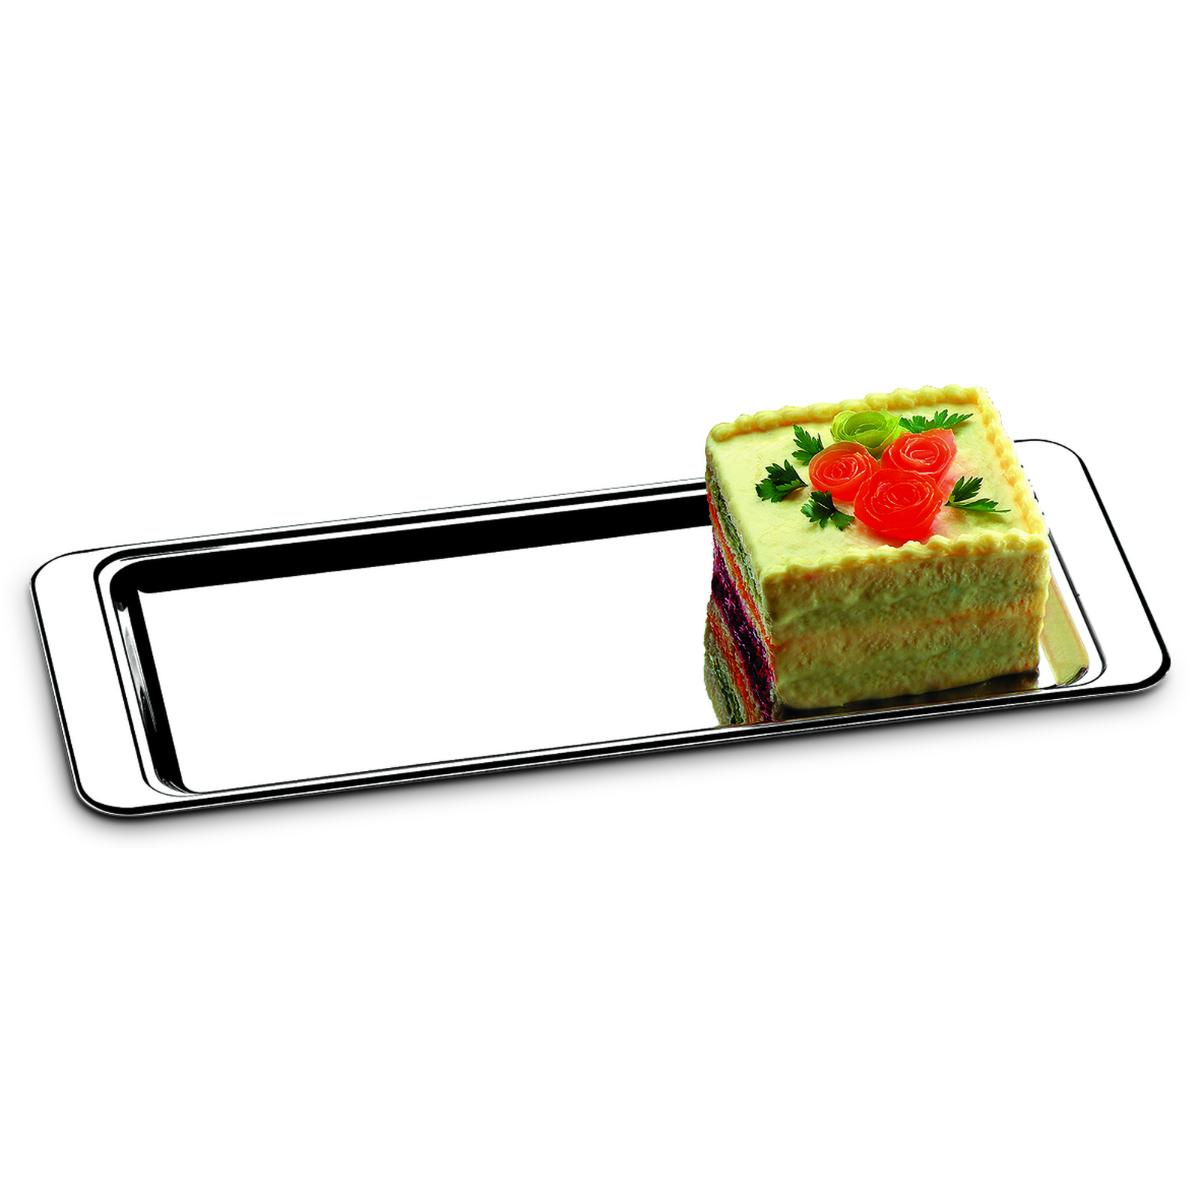 Bandeja Para Torta Fria & Rocambole Atina 40 cm